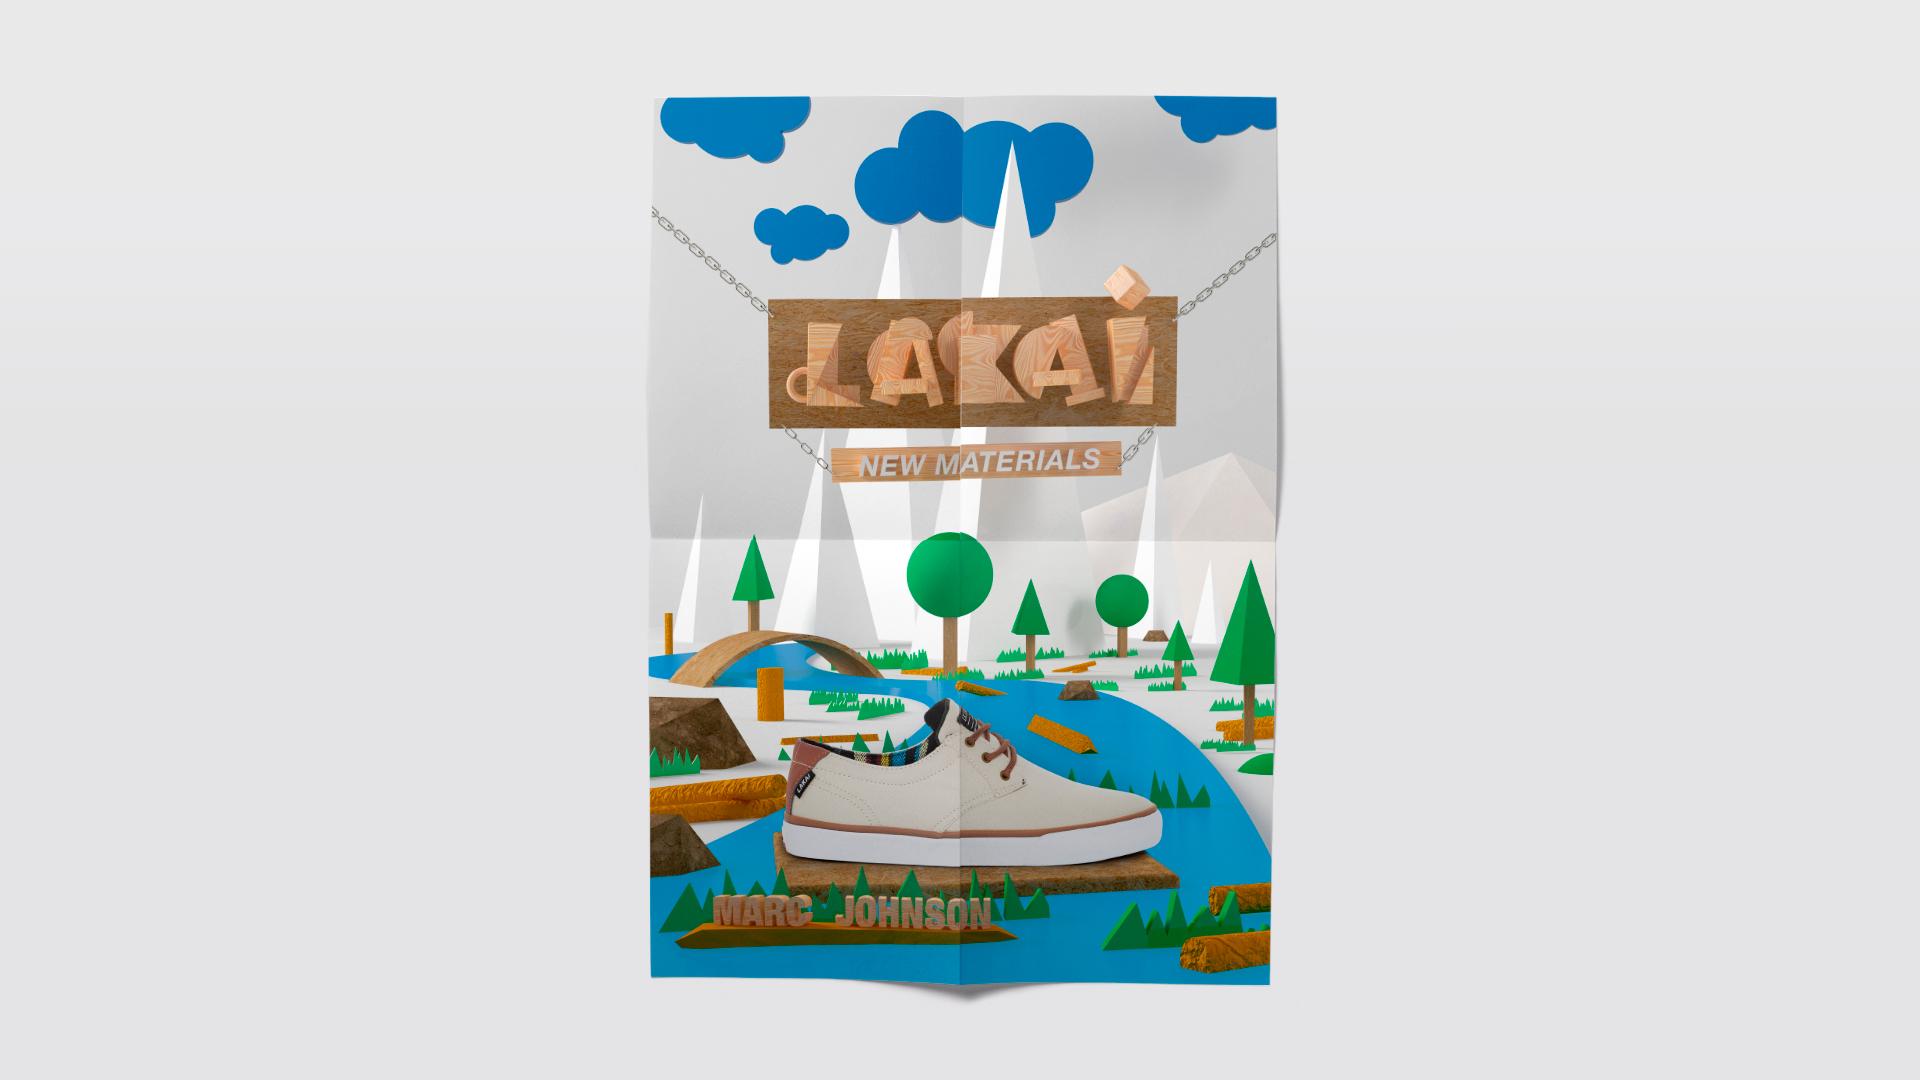 2_advertising_lakai_shoes_artdirection